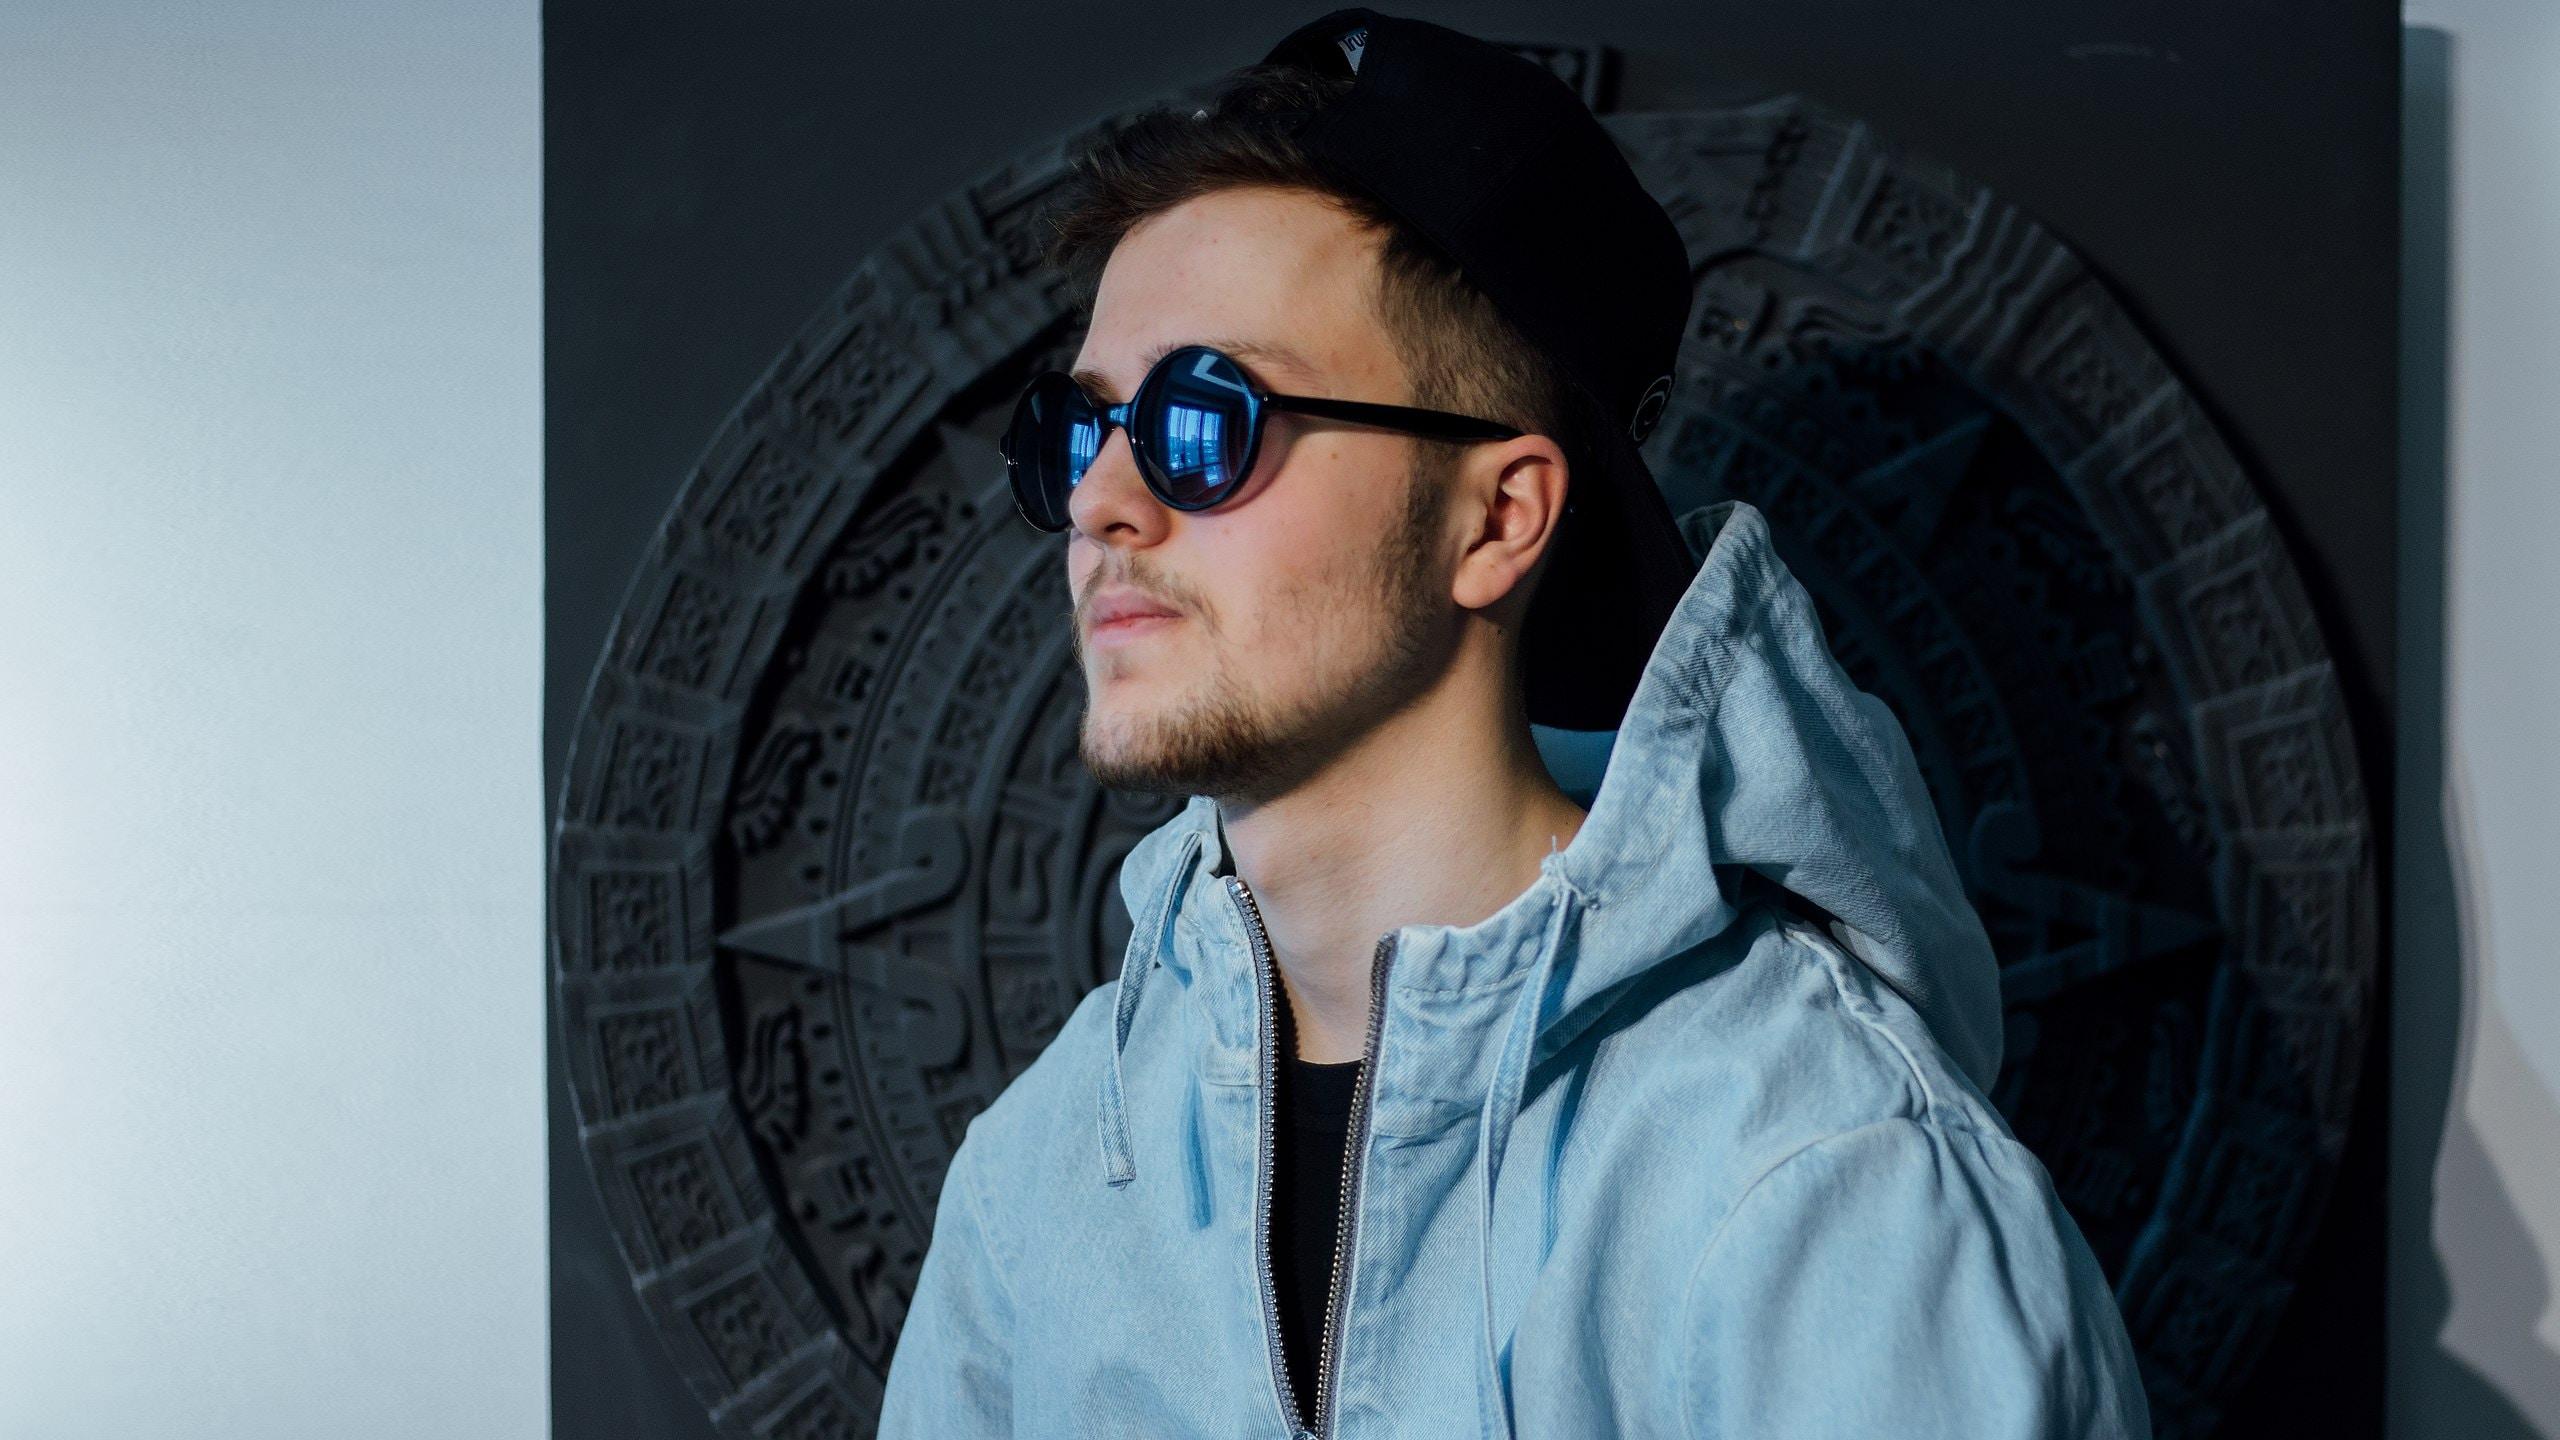 Go to Vlad Shalaginov's profile